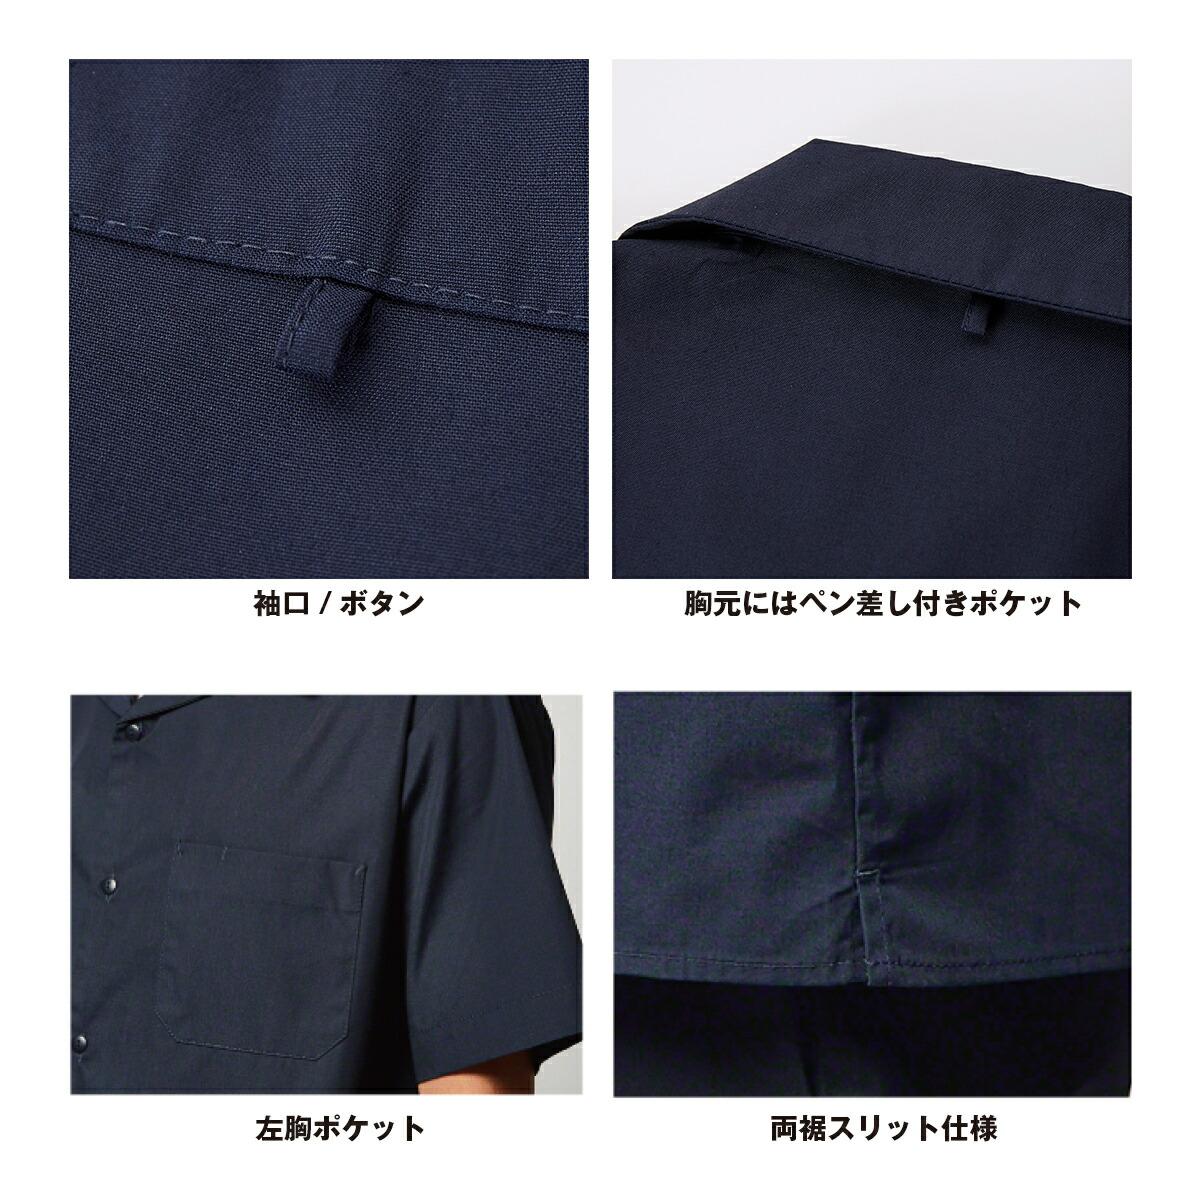 T/C オープンカラー シャツ